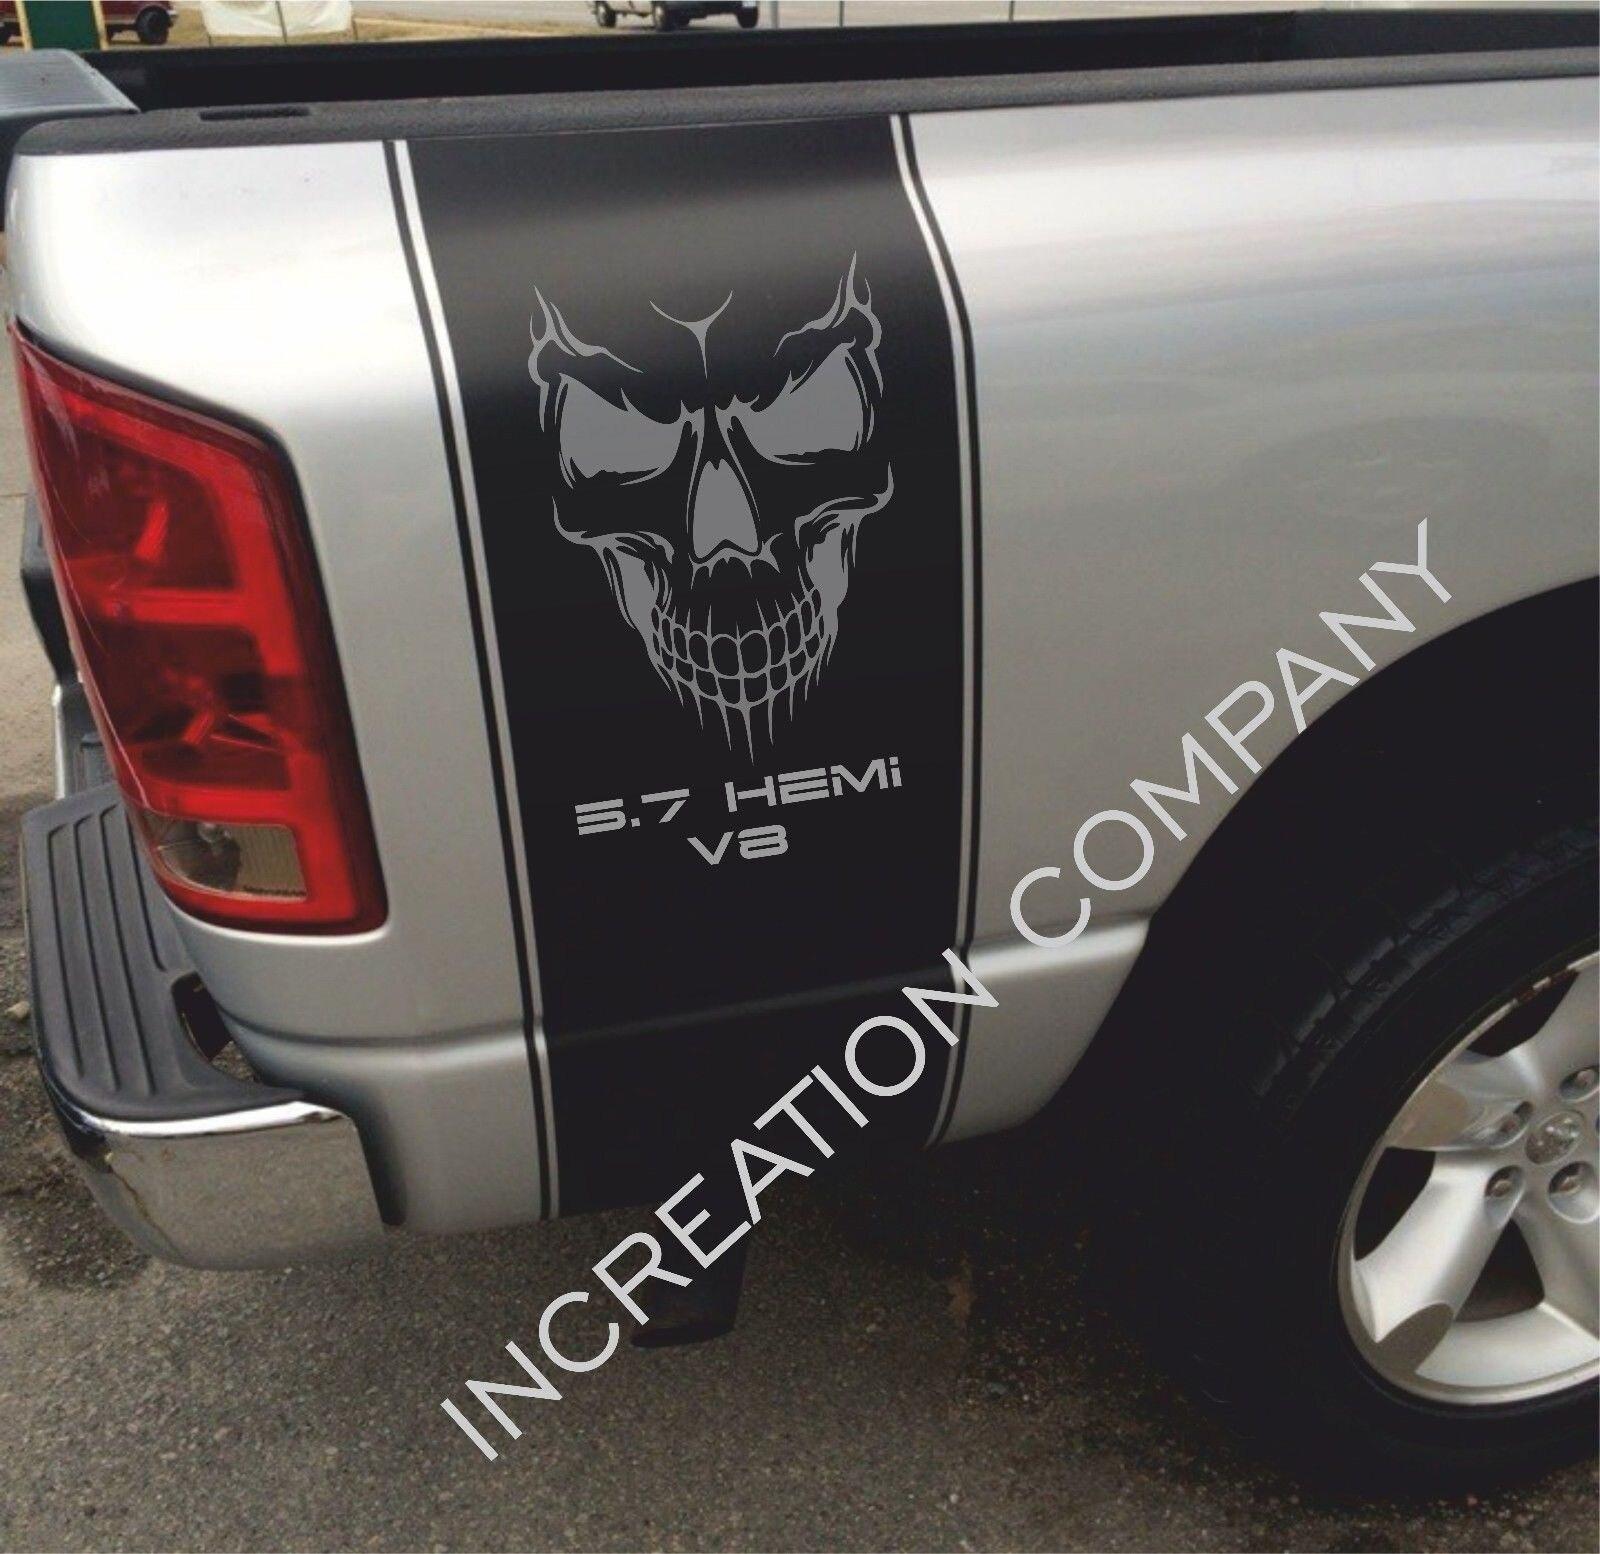 Dodge Ram 1500 2500 3500 Vinyl Decal Racing Sticker Stripe Hemi Mopar 5.7L T-265